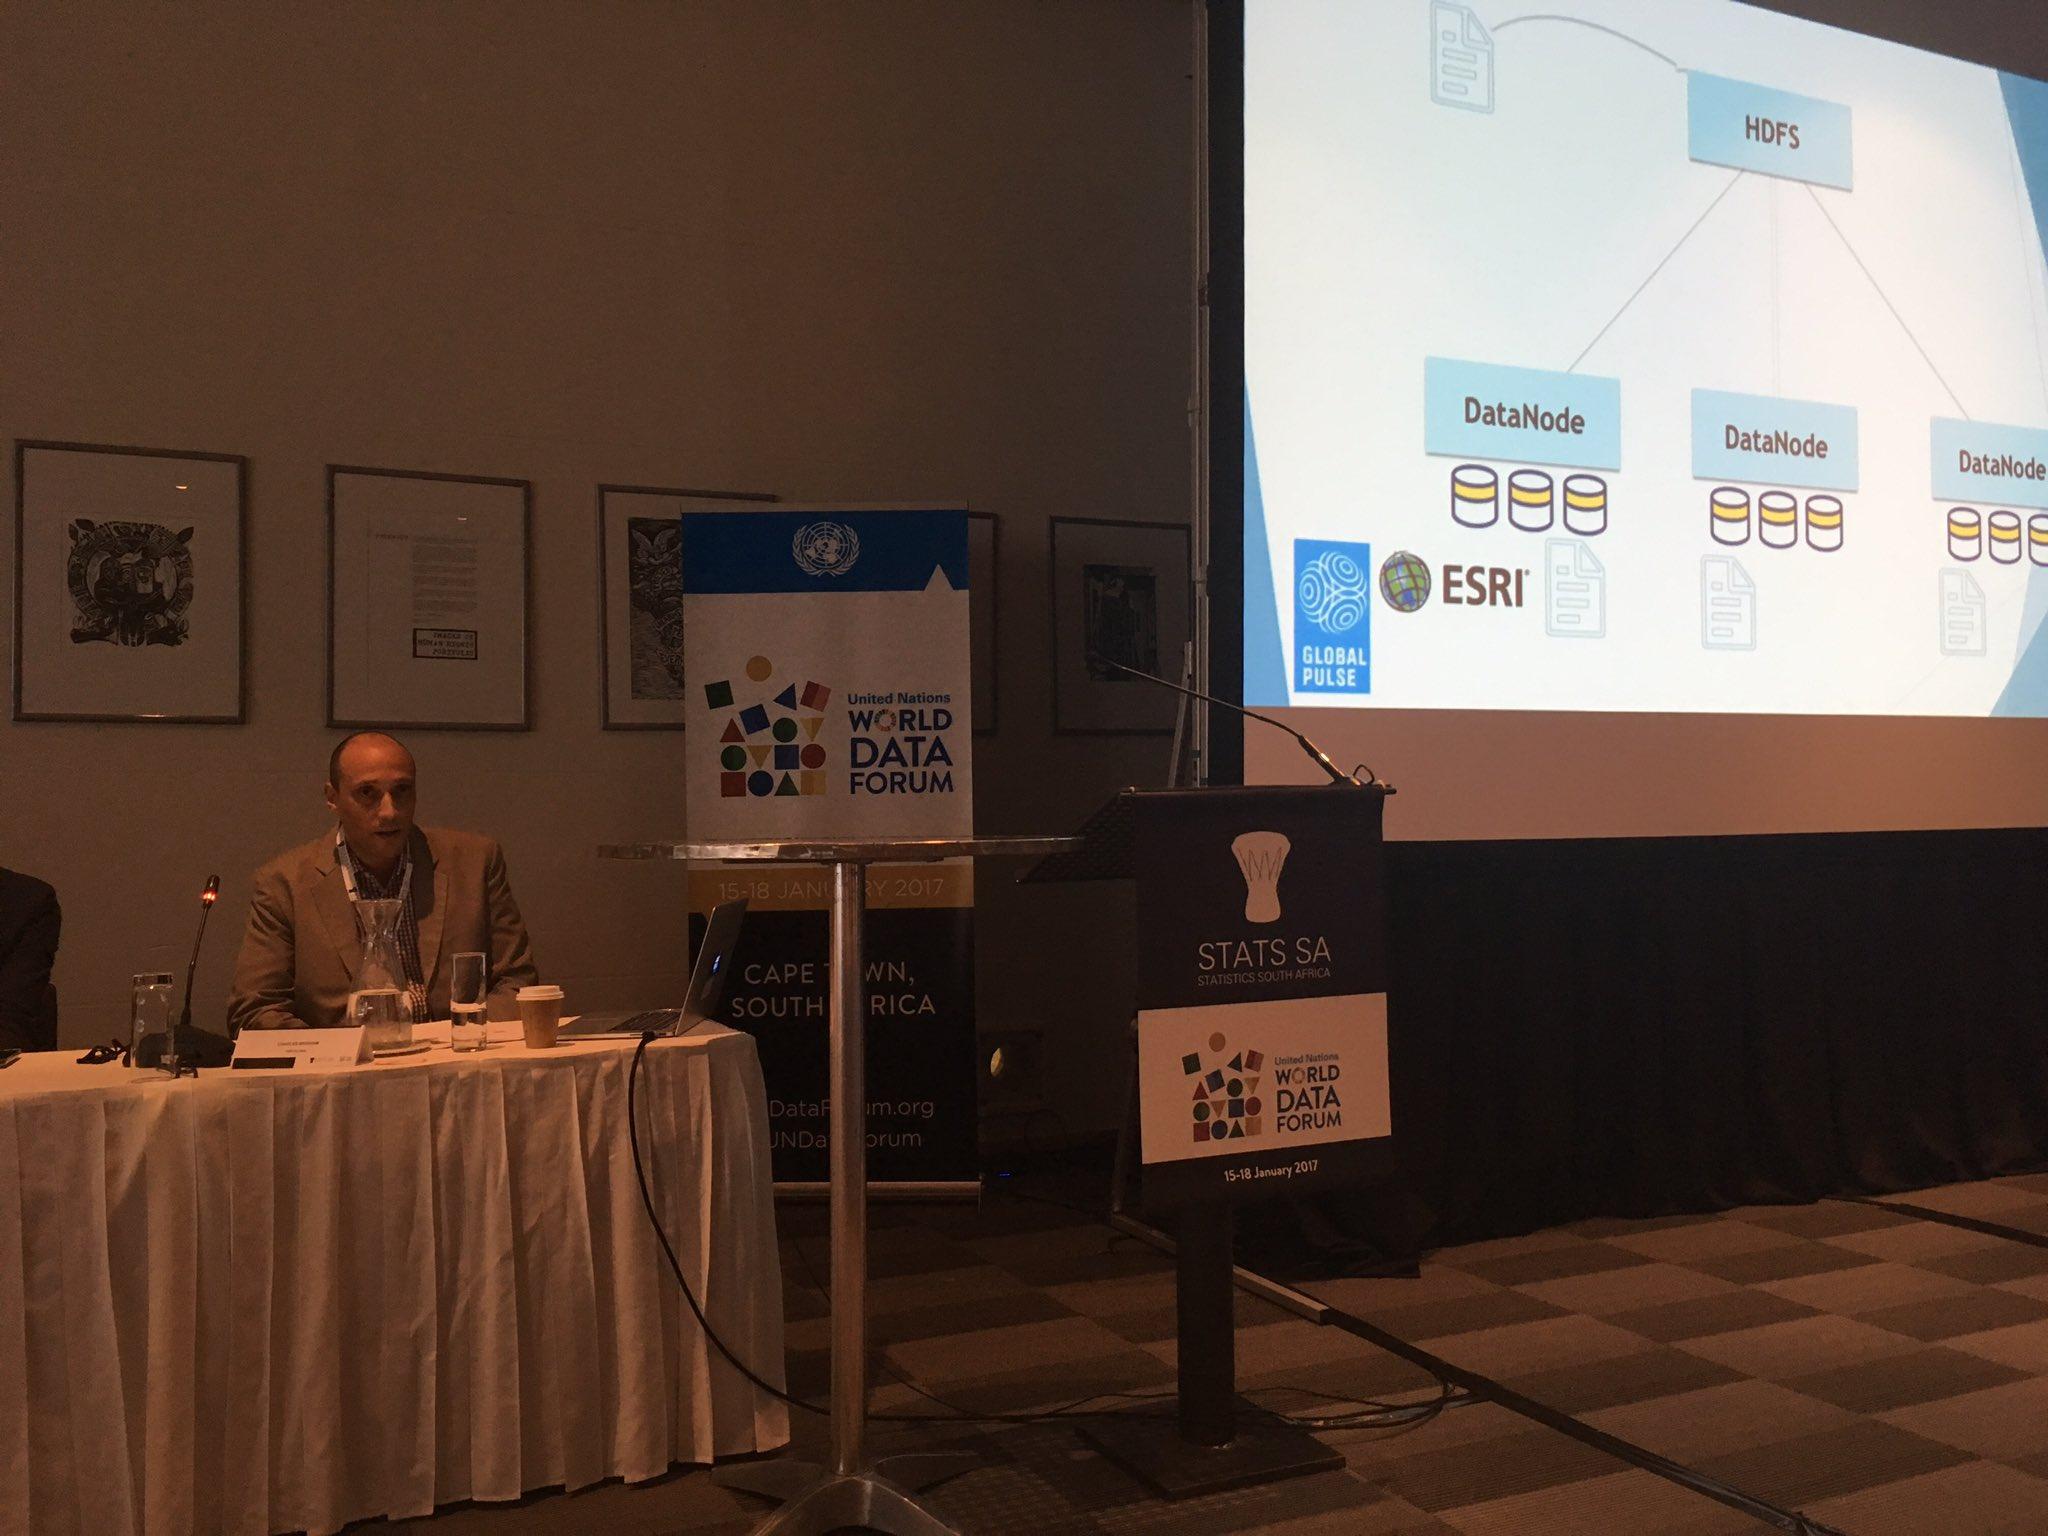 @Esri @PulseLabKampala &@UNGlobalPulse hosting a session at @UNDataForum on using big data for SDGs https://t.co/XA3ELlfEIs